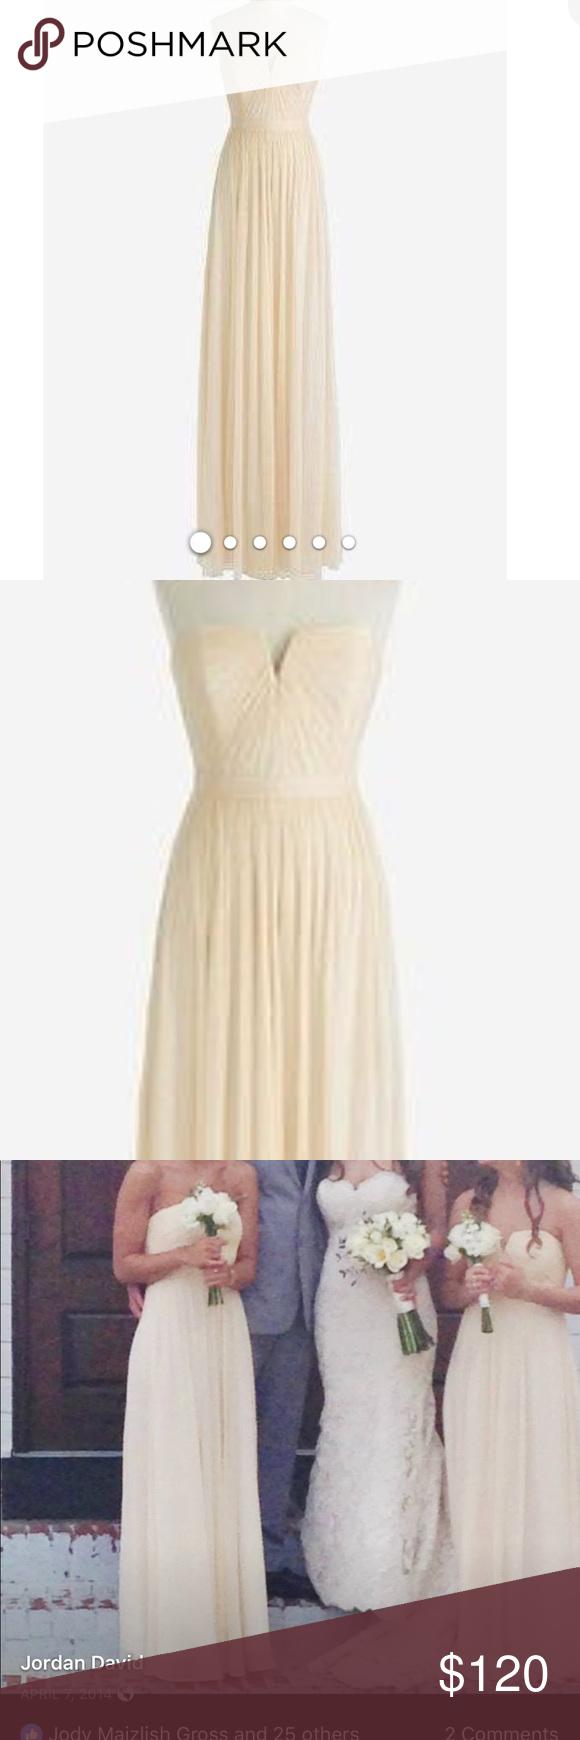 J. Crew Bridesmaid / Prom Dress | Pinterest